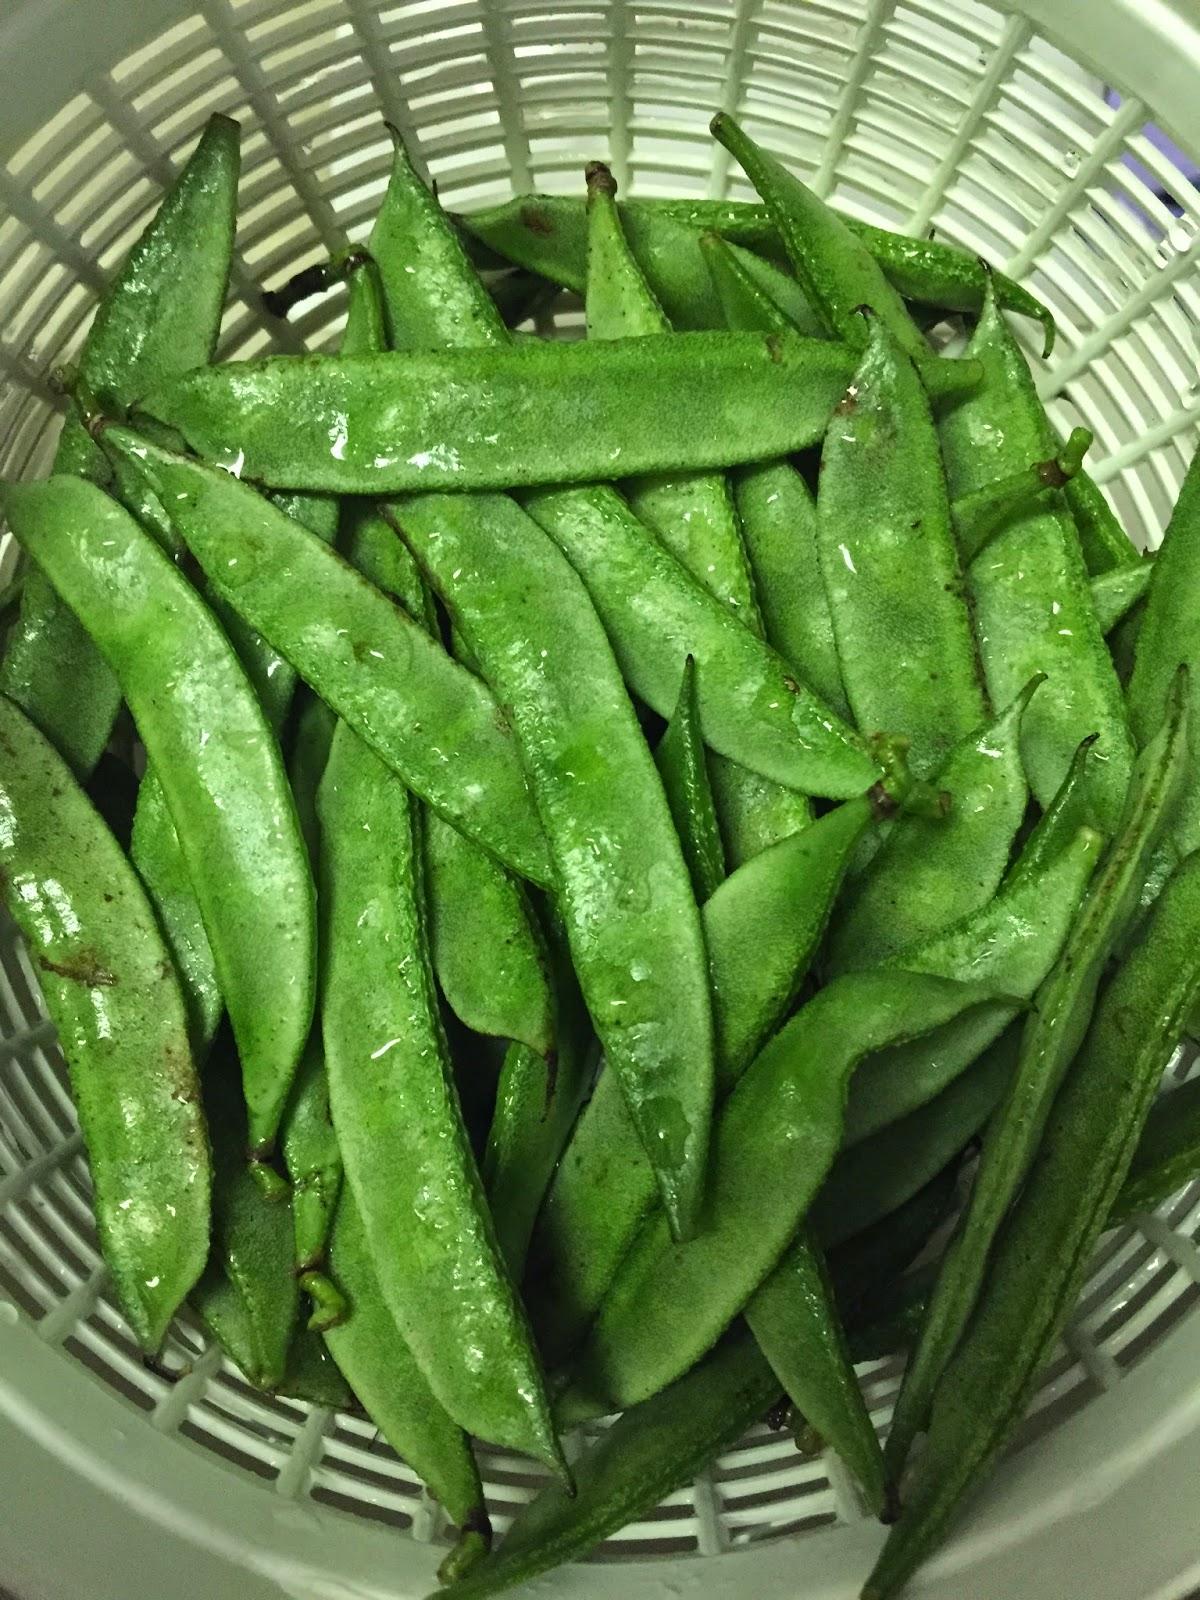 Chikkudukaya Nuvulapodi Kura (Broad beans Curry with